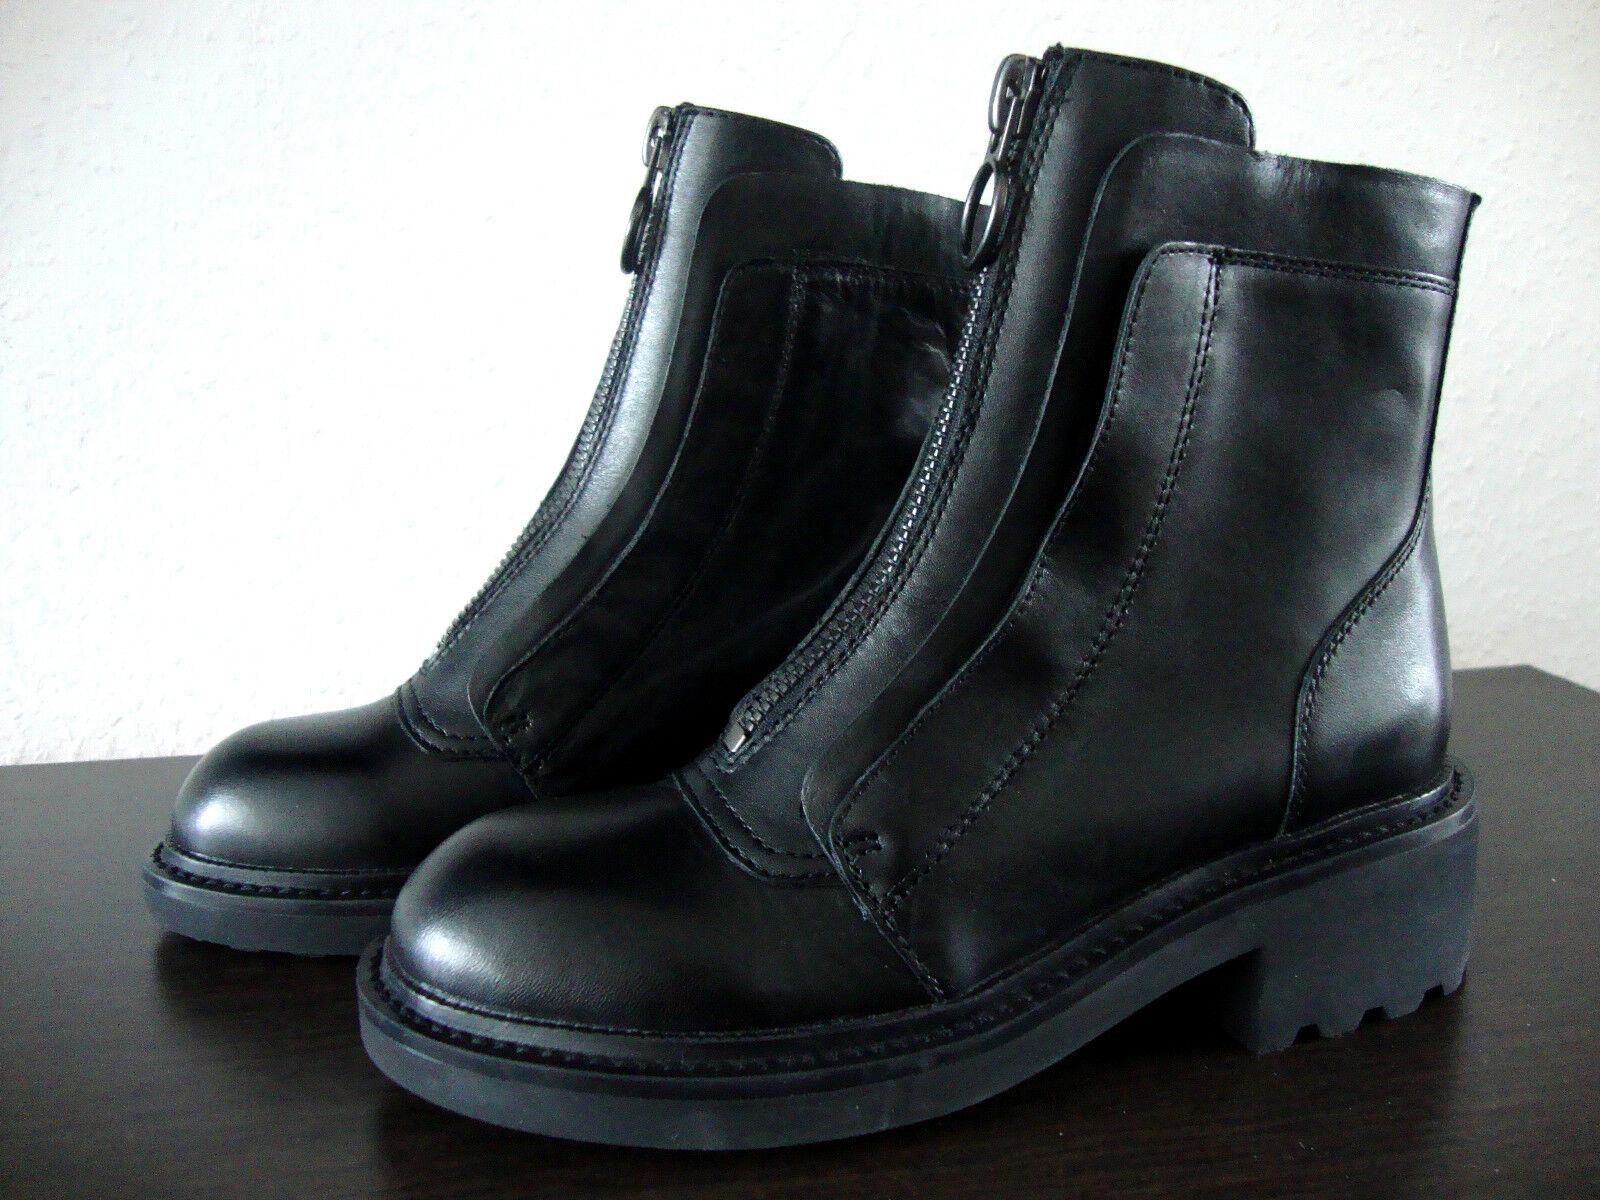 ASH SPACE Stiefel Damen Stiefelette Schuhe Ankle Stiefel Stiefel Leder Schuhe Stiefelette Gr.36 NEU 475857